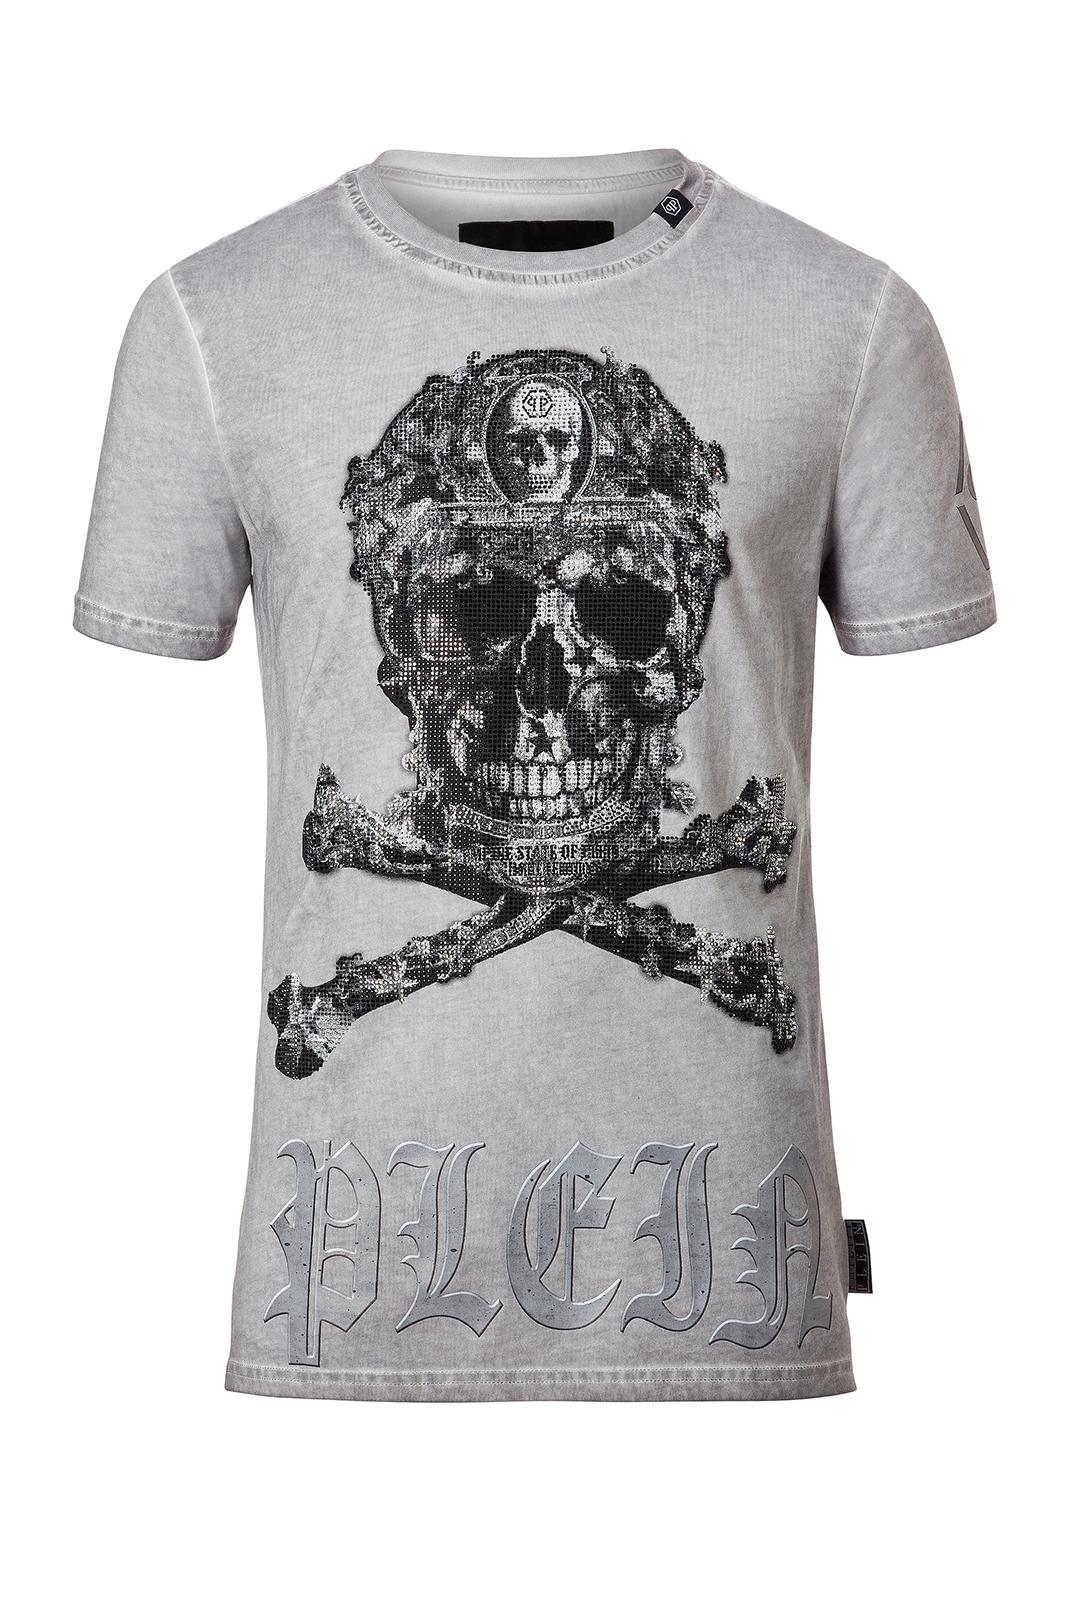 Tee-shirts  Philipp plein MTK1283 KEVIN 10 GREY